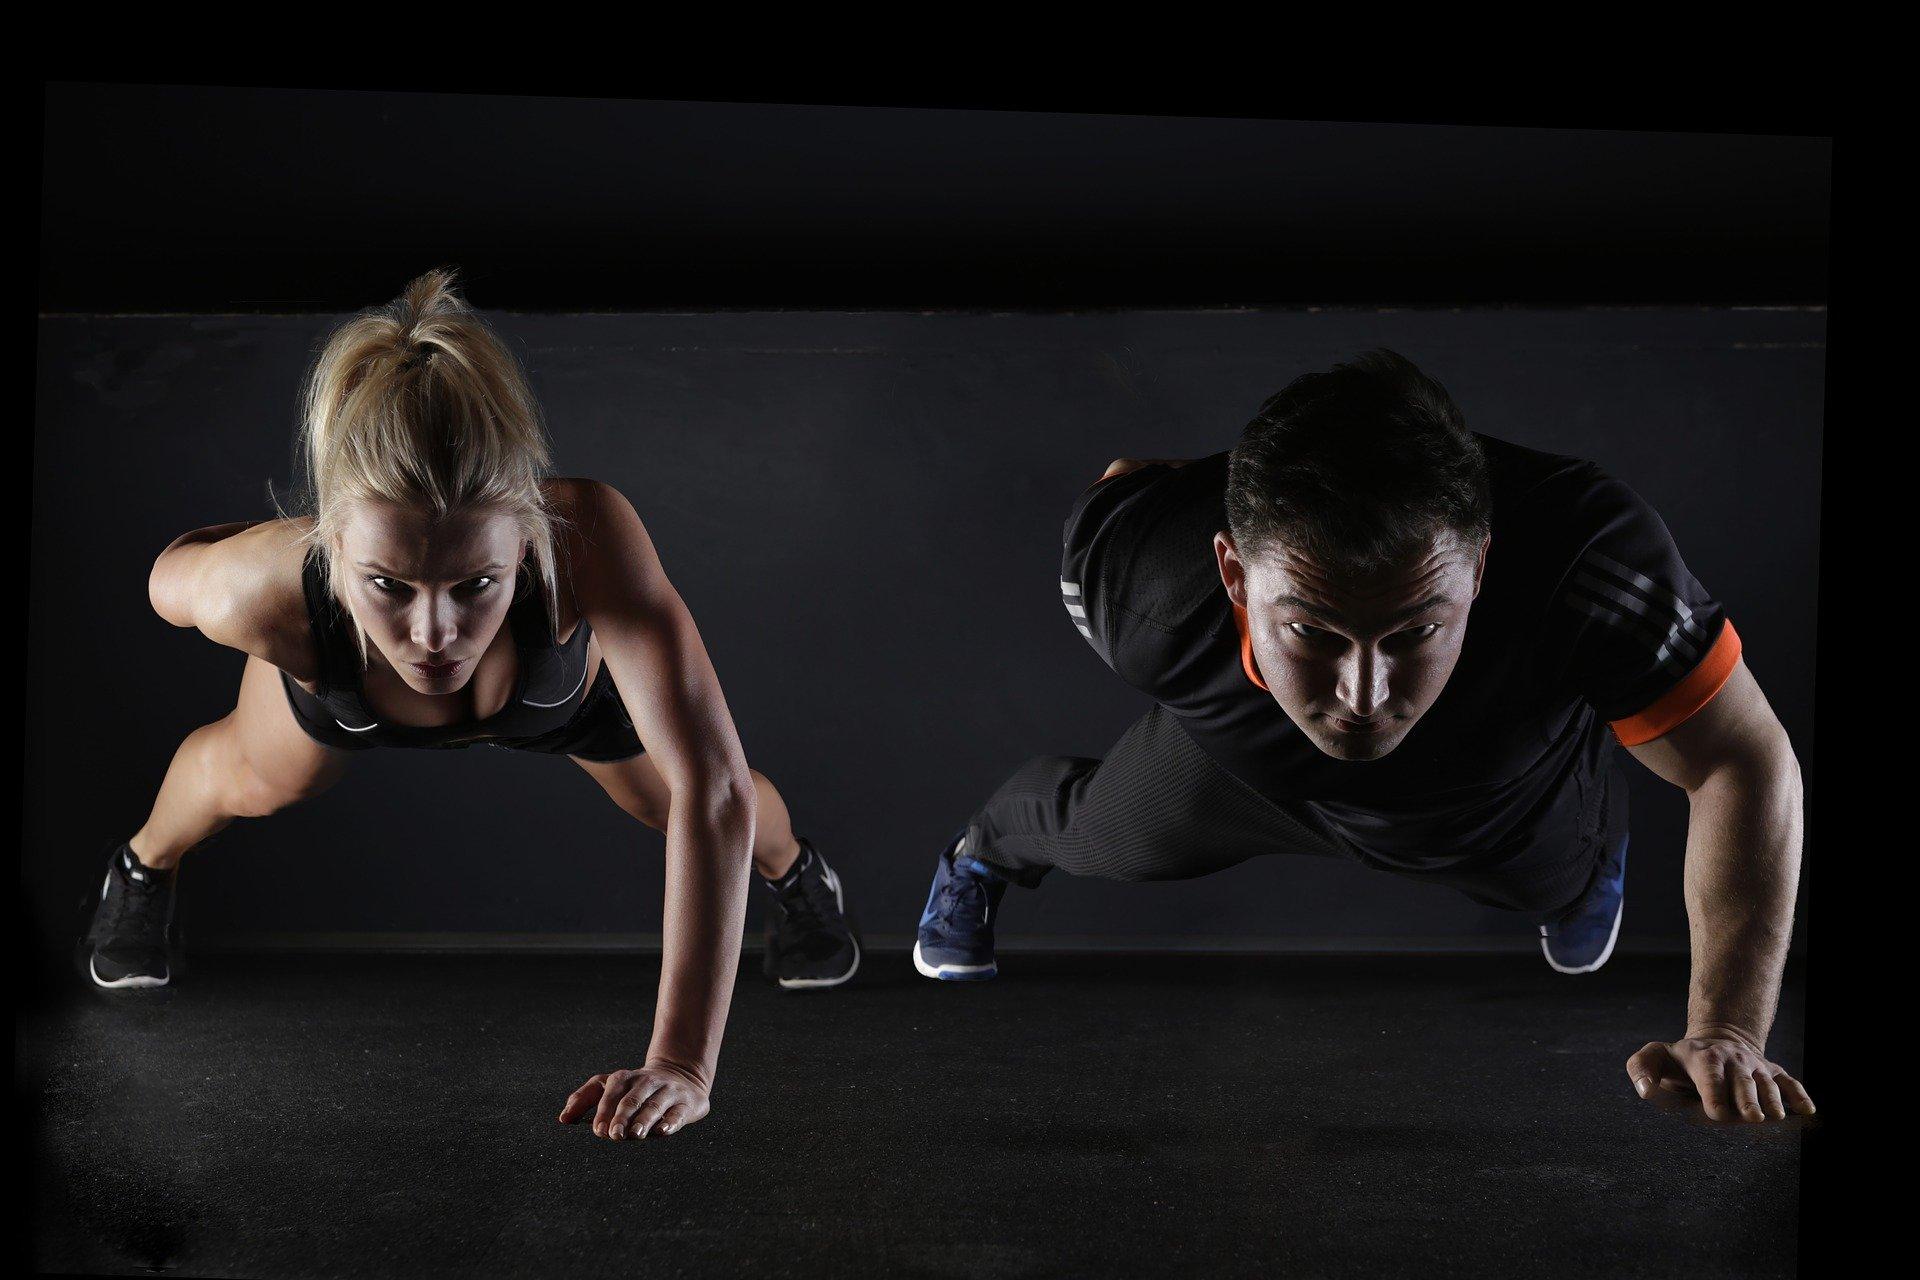 Man and woman doing push-ups